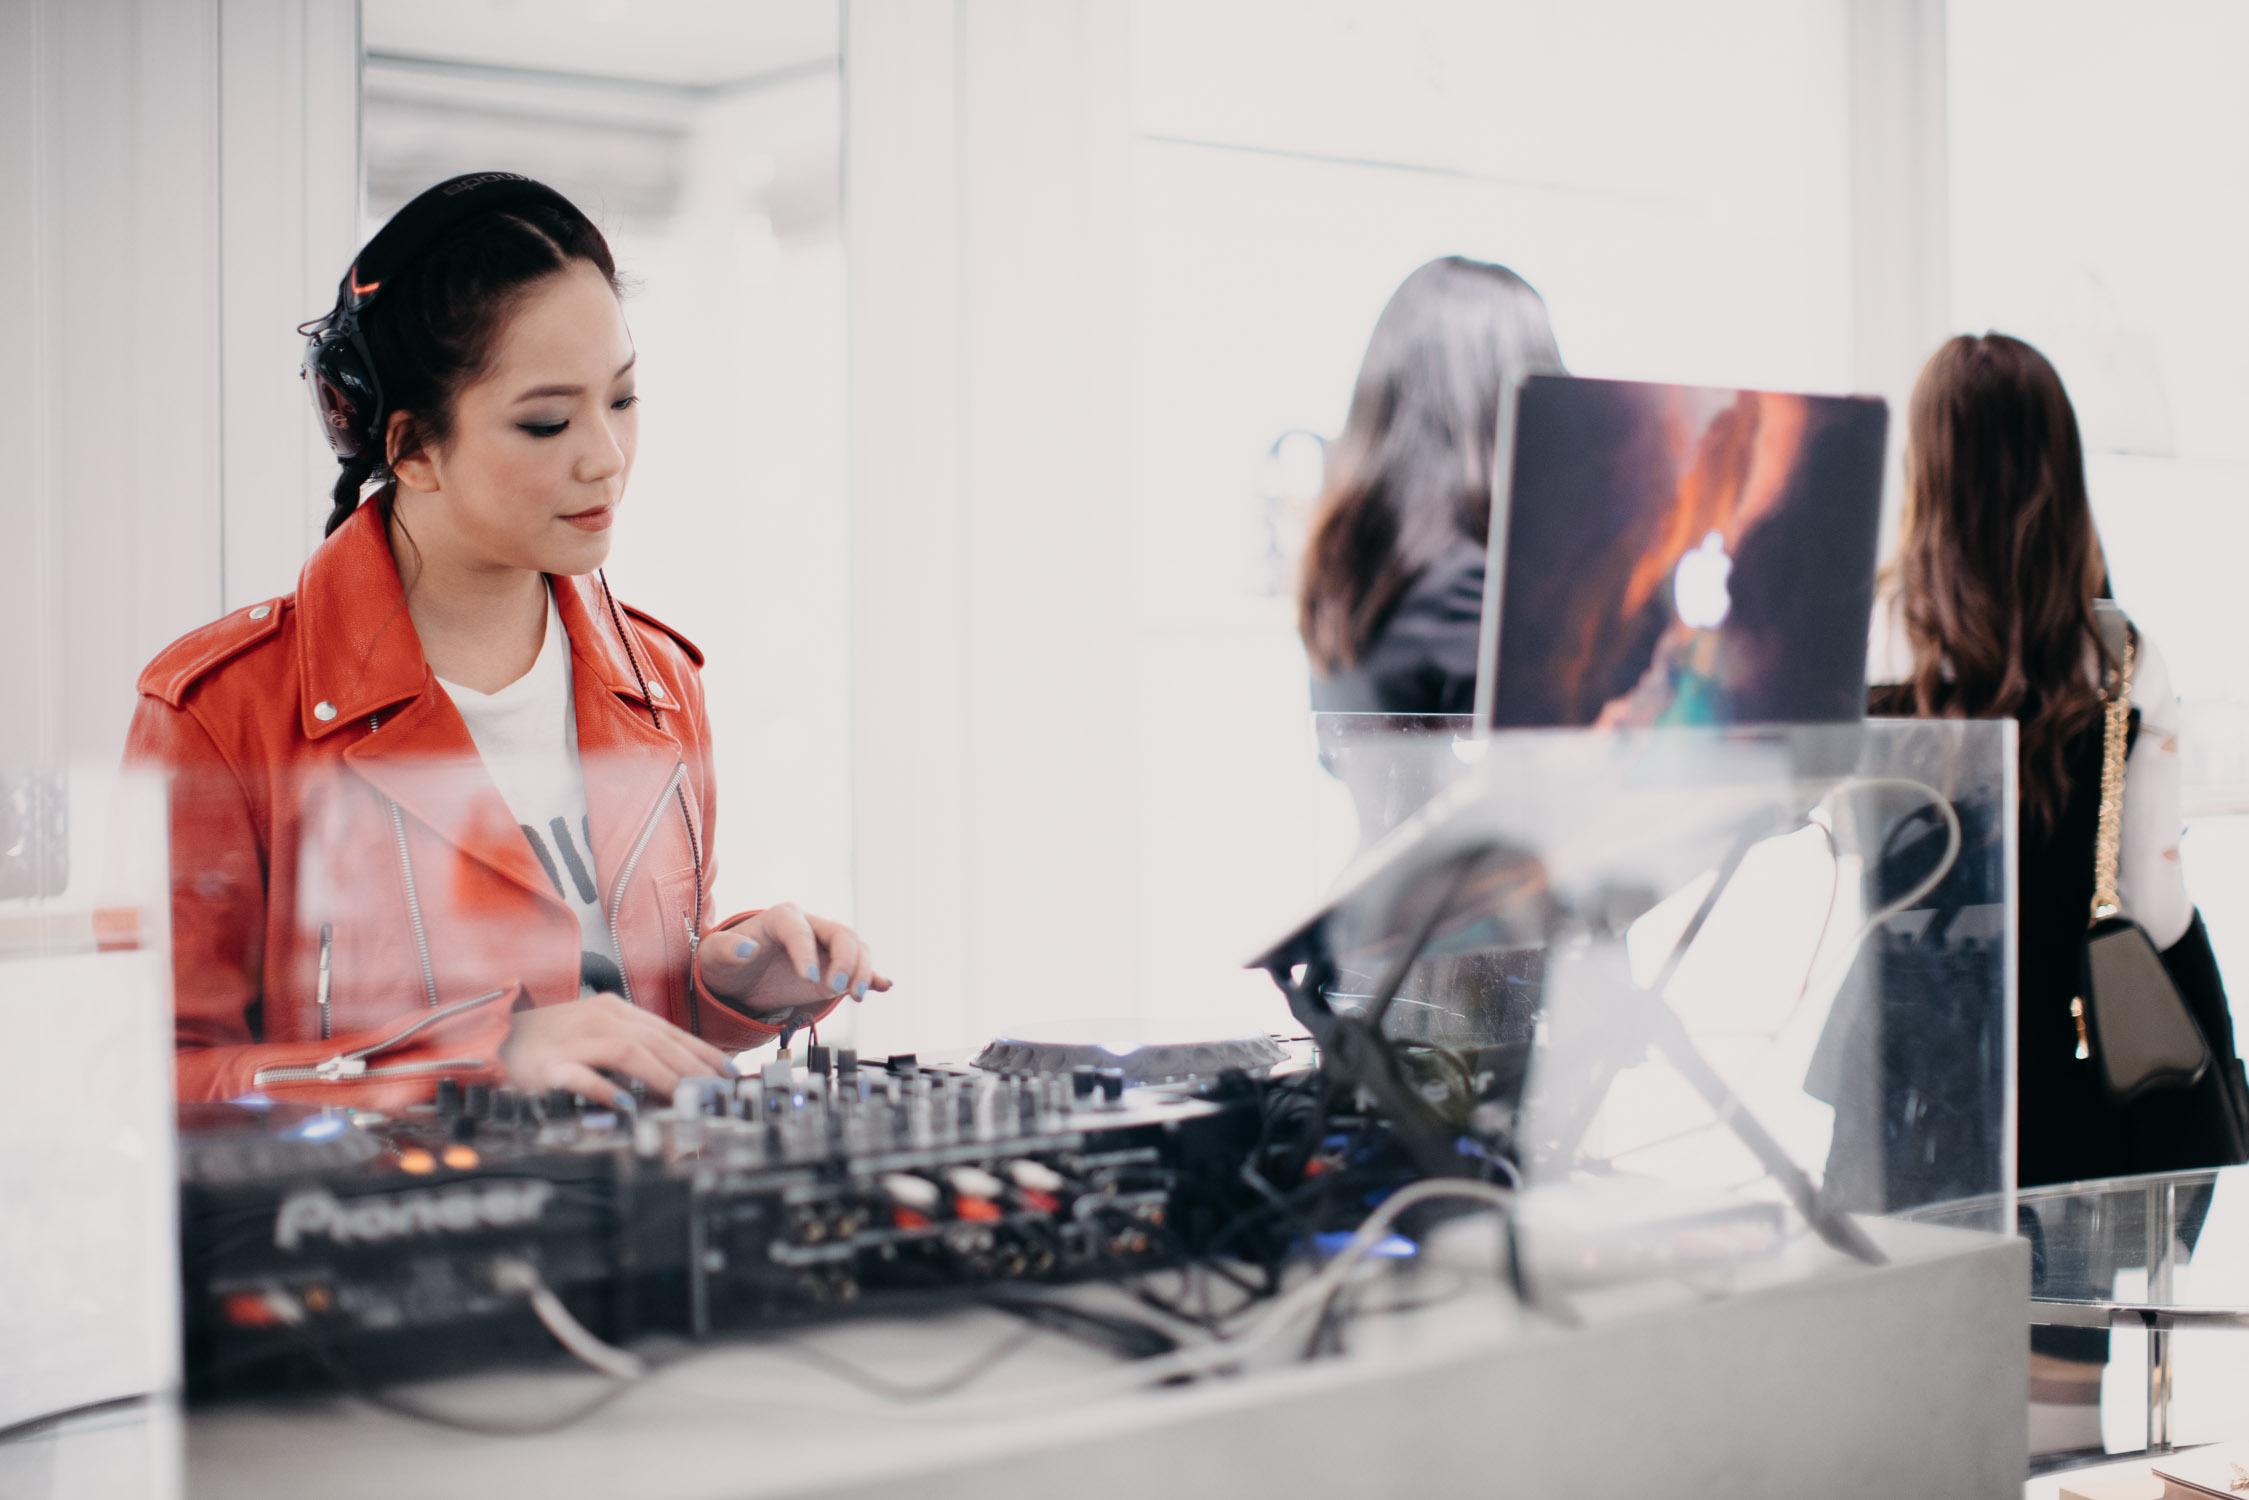 3-dior-hong-kong-womens-dior-event-photography.jpg